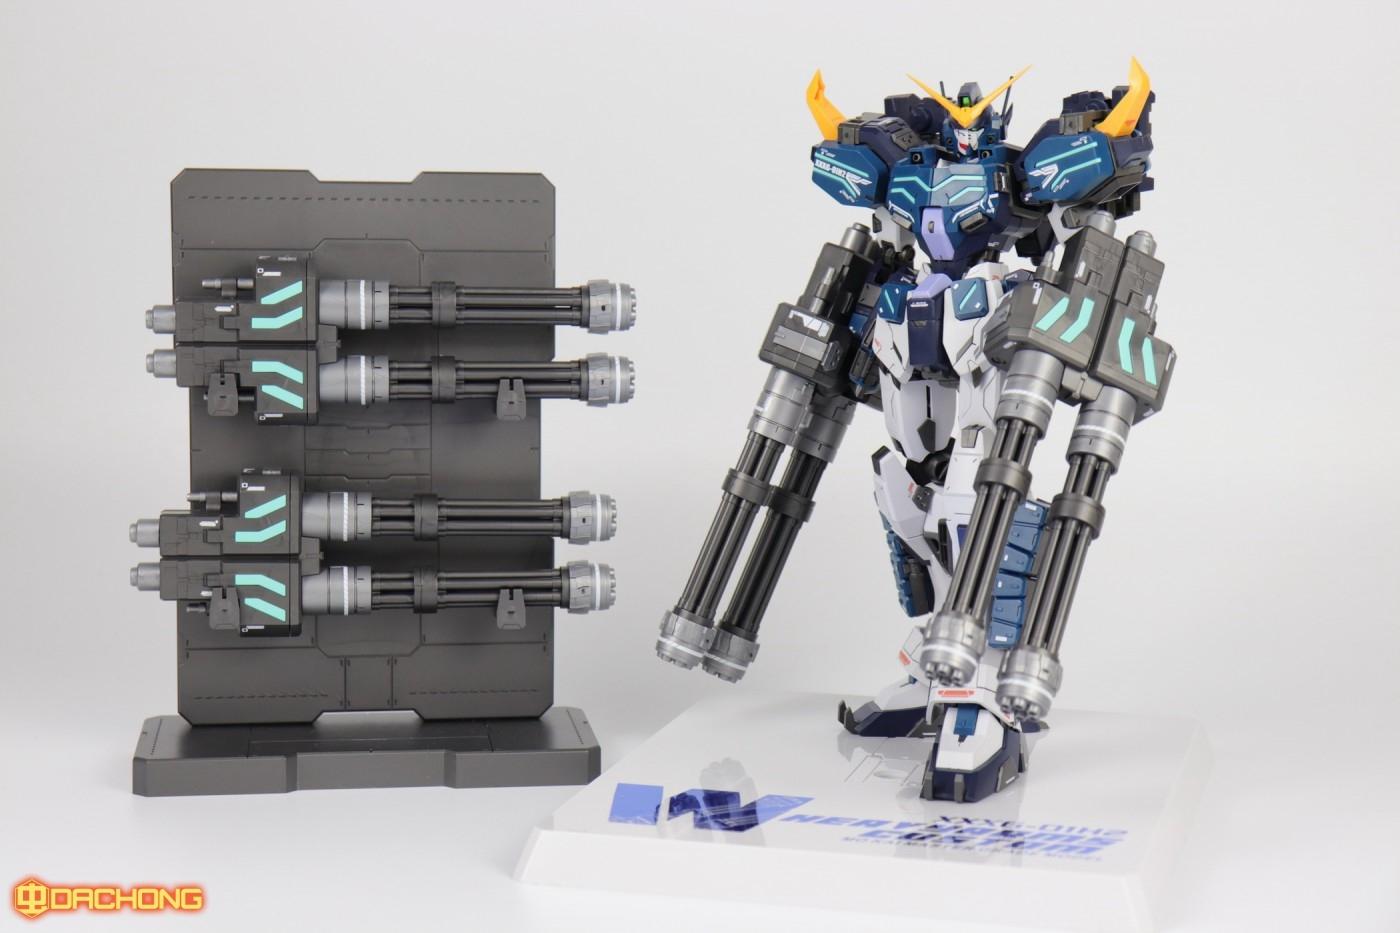 S296_MG_heavy_107.jpg